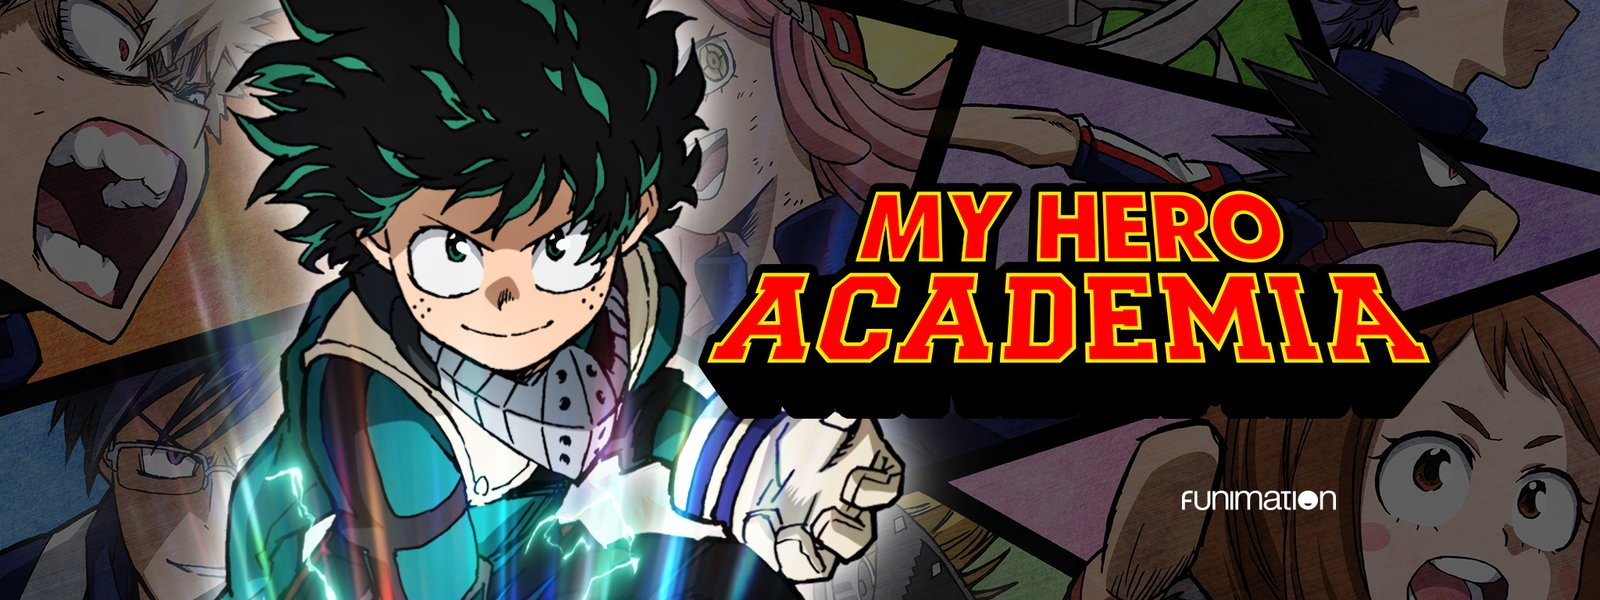 My Hero Academia saison 3 revient sur ADN